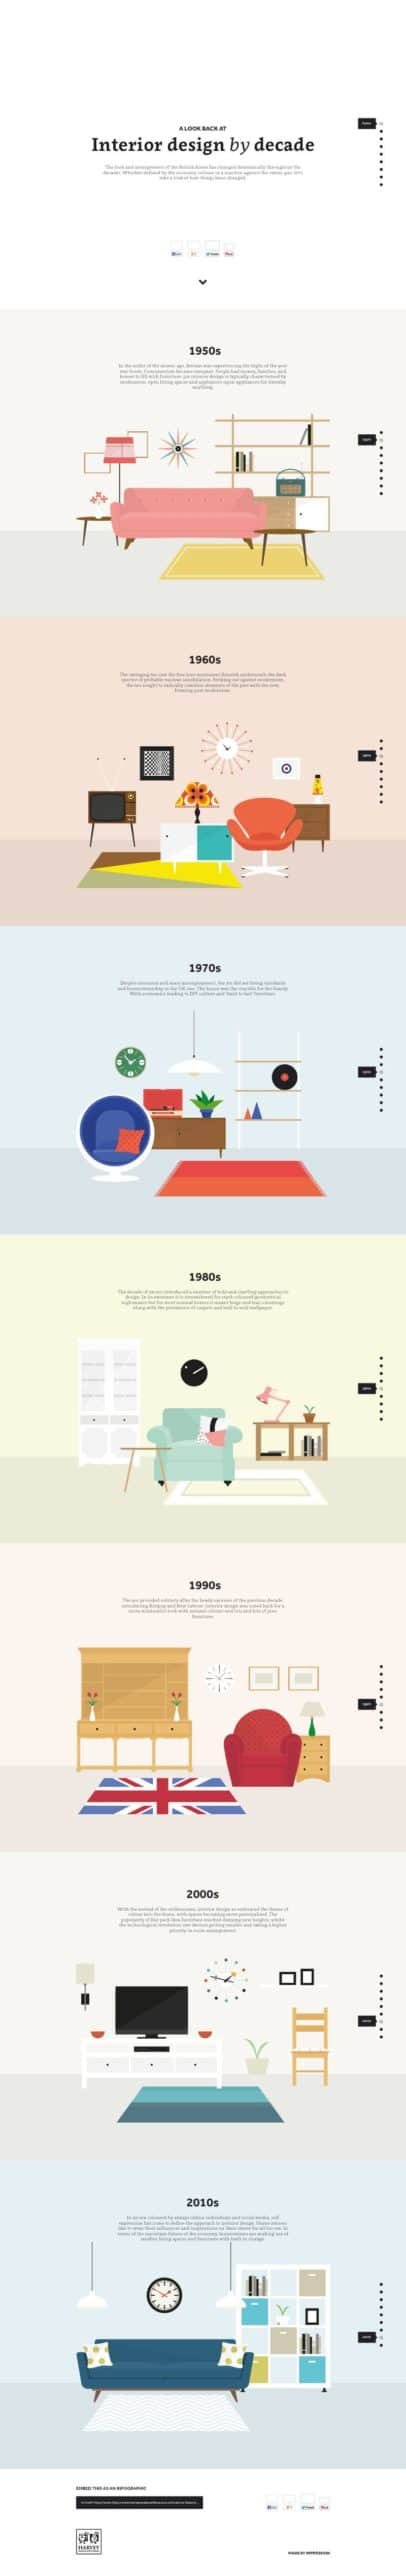 Conozca la historia del diseño de interiores #infografia